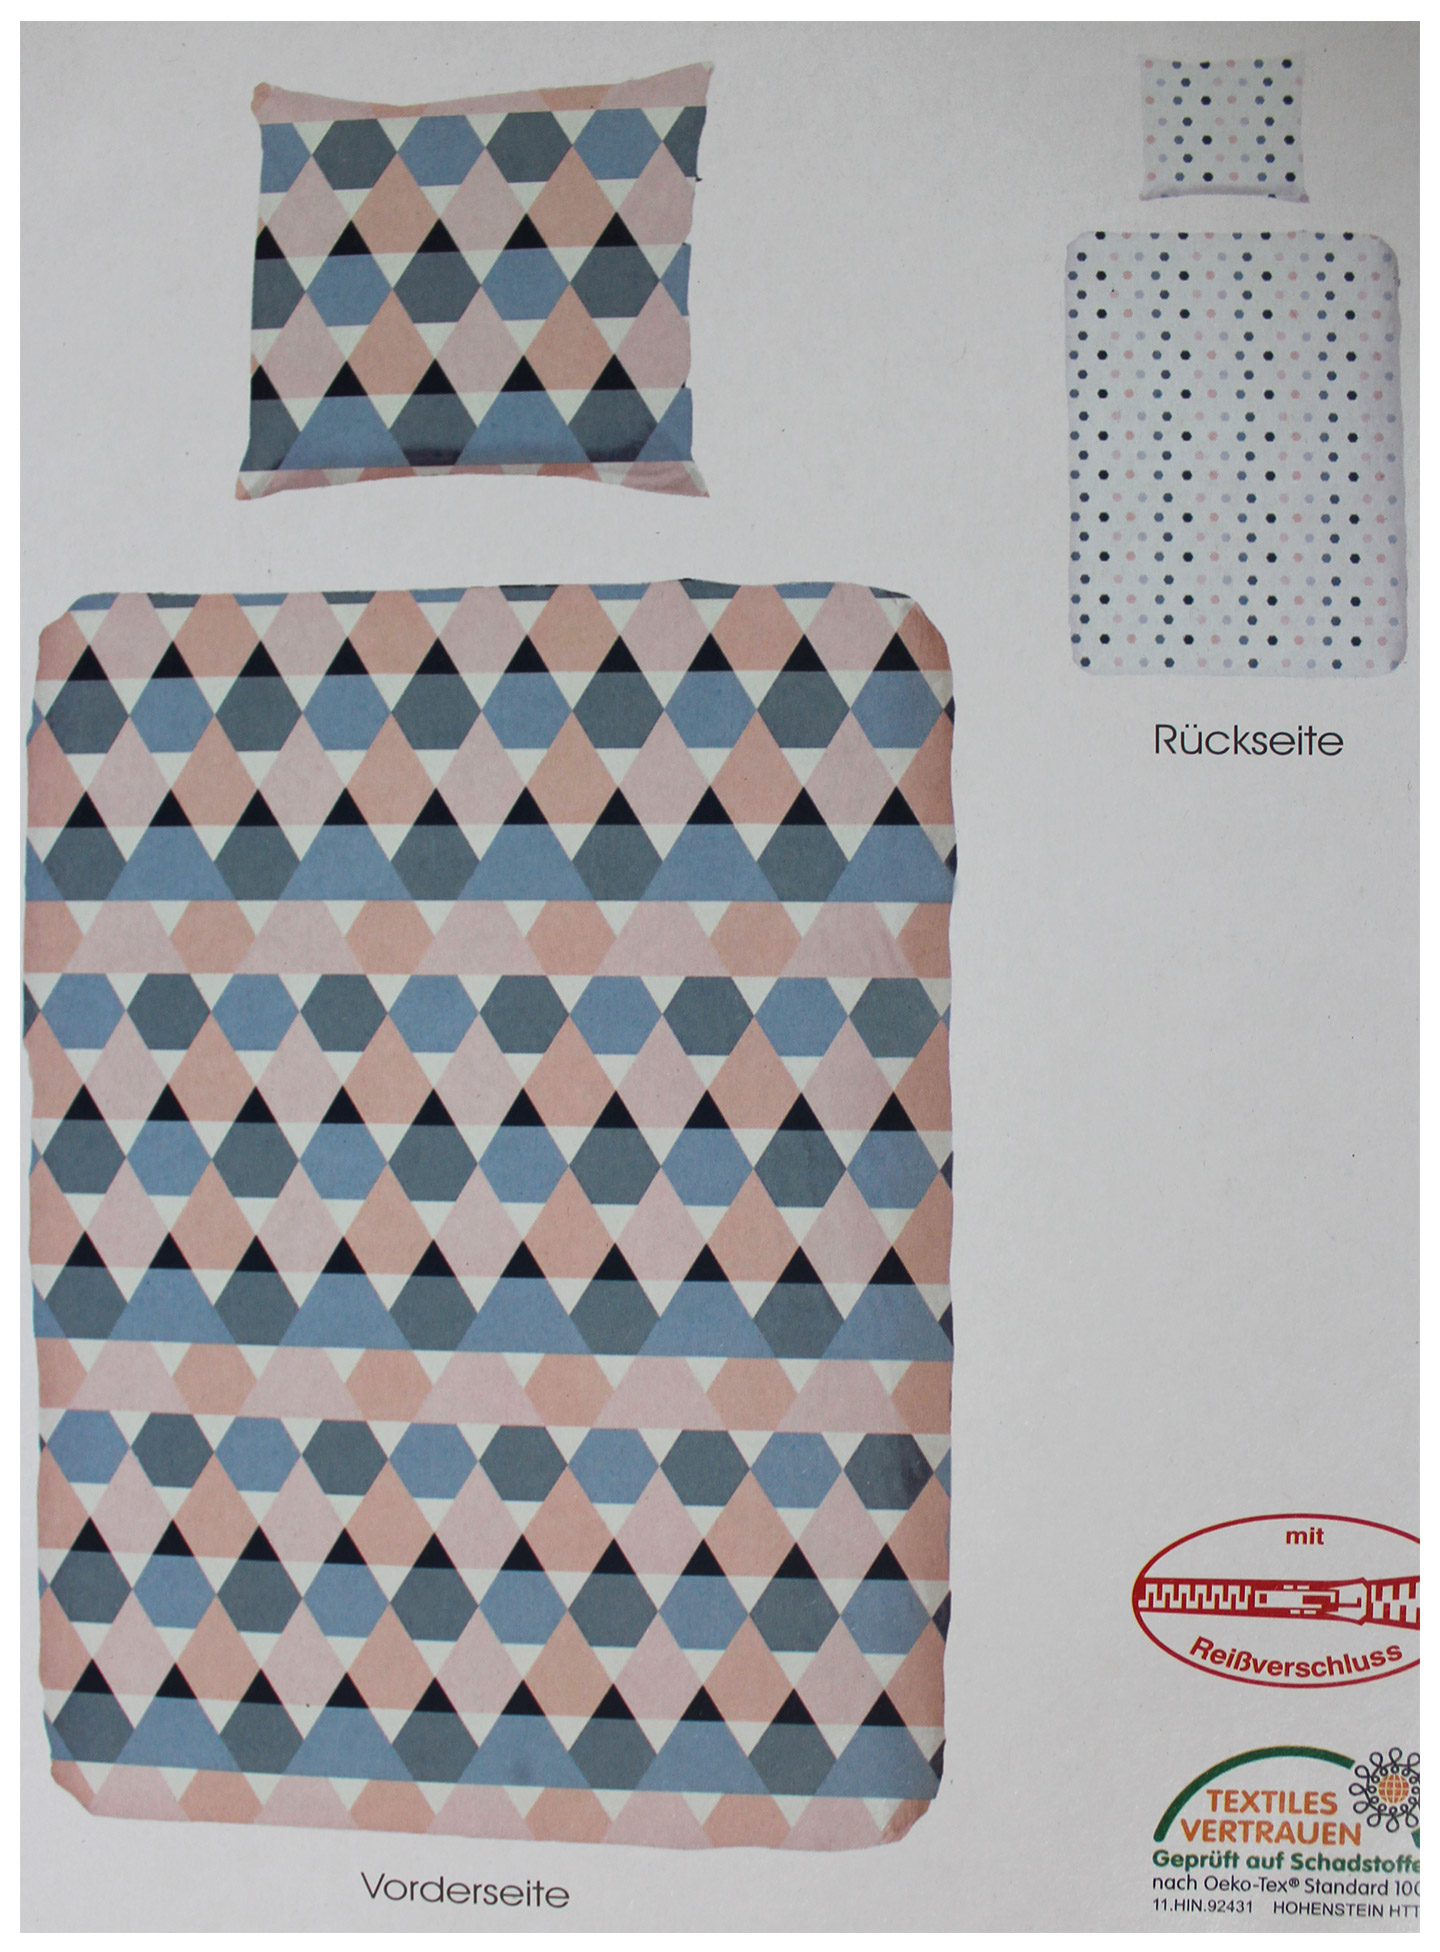 wende bettw sche bergr e 155x220 80x80cm multicolor rauten muster microfaser kh. Black Bedroom Furniture Sets. Home Design Ideas